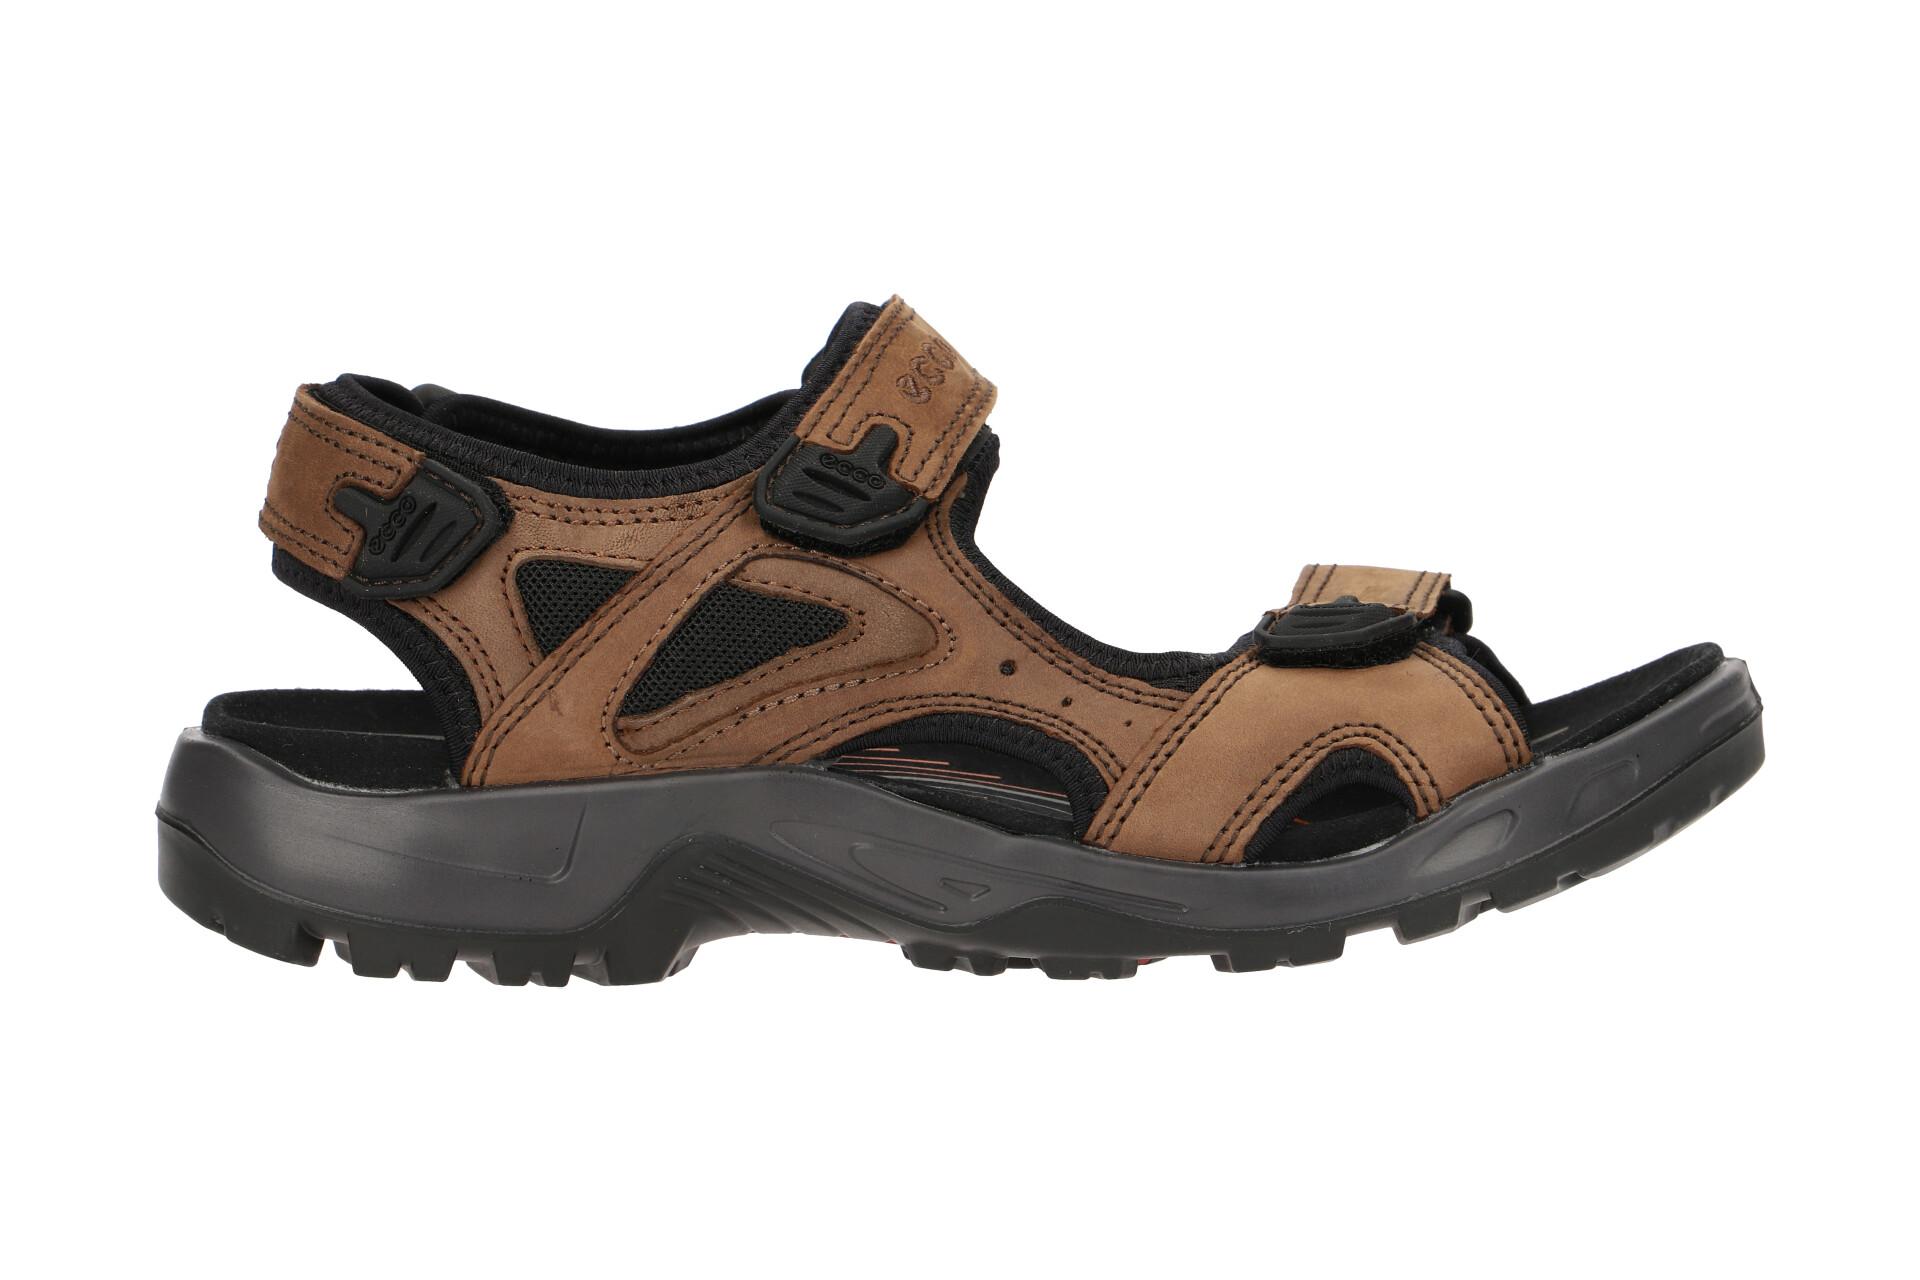 Braun Herren Sandale Neu Details Zu Schuhe 82212456885 Offroad Ecco EHID2W9